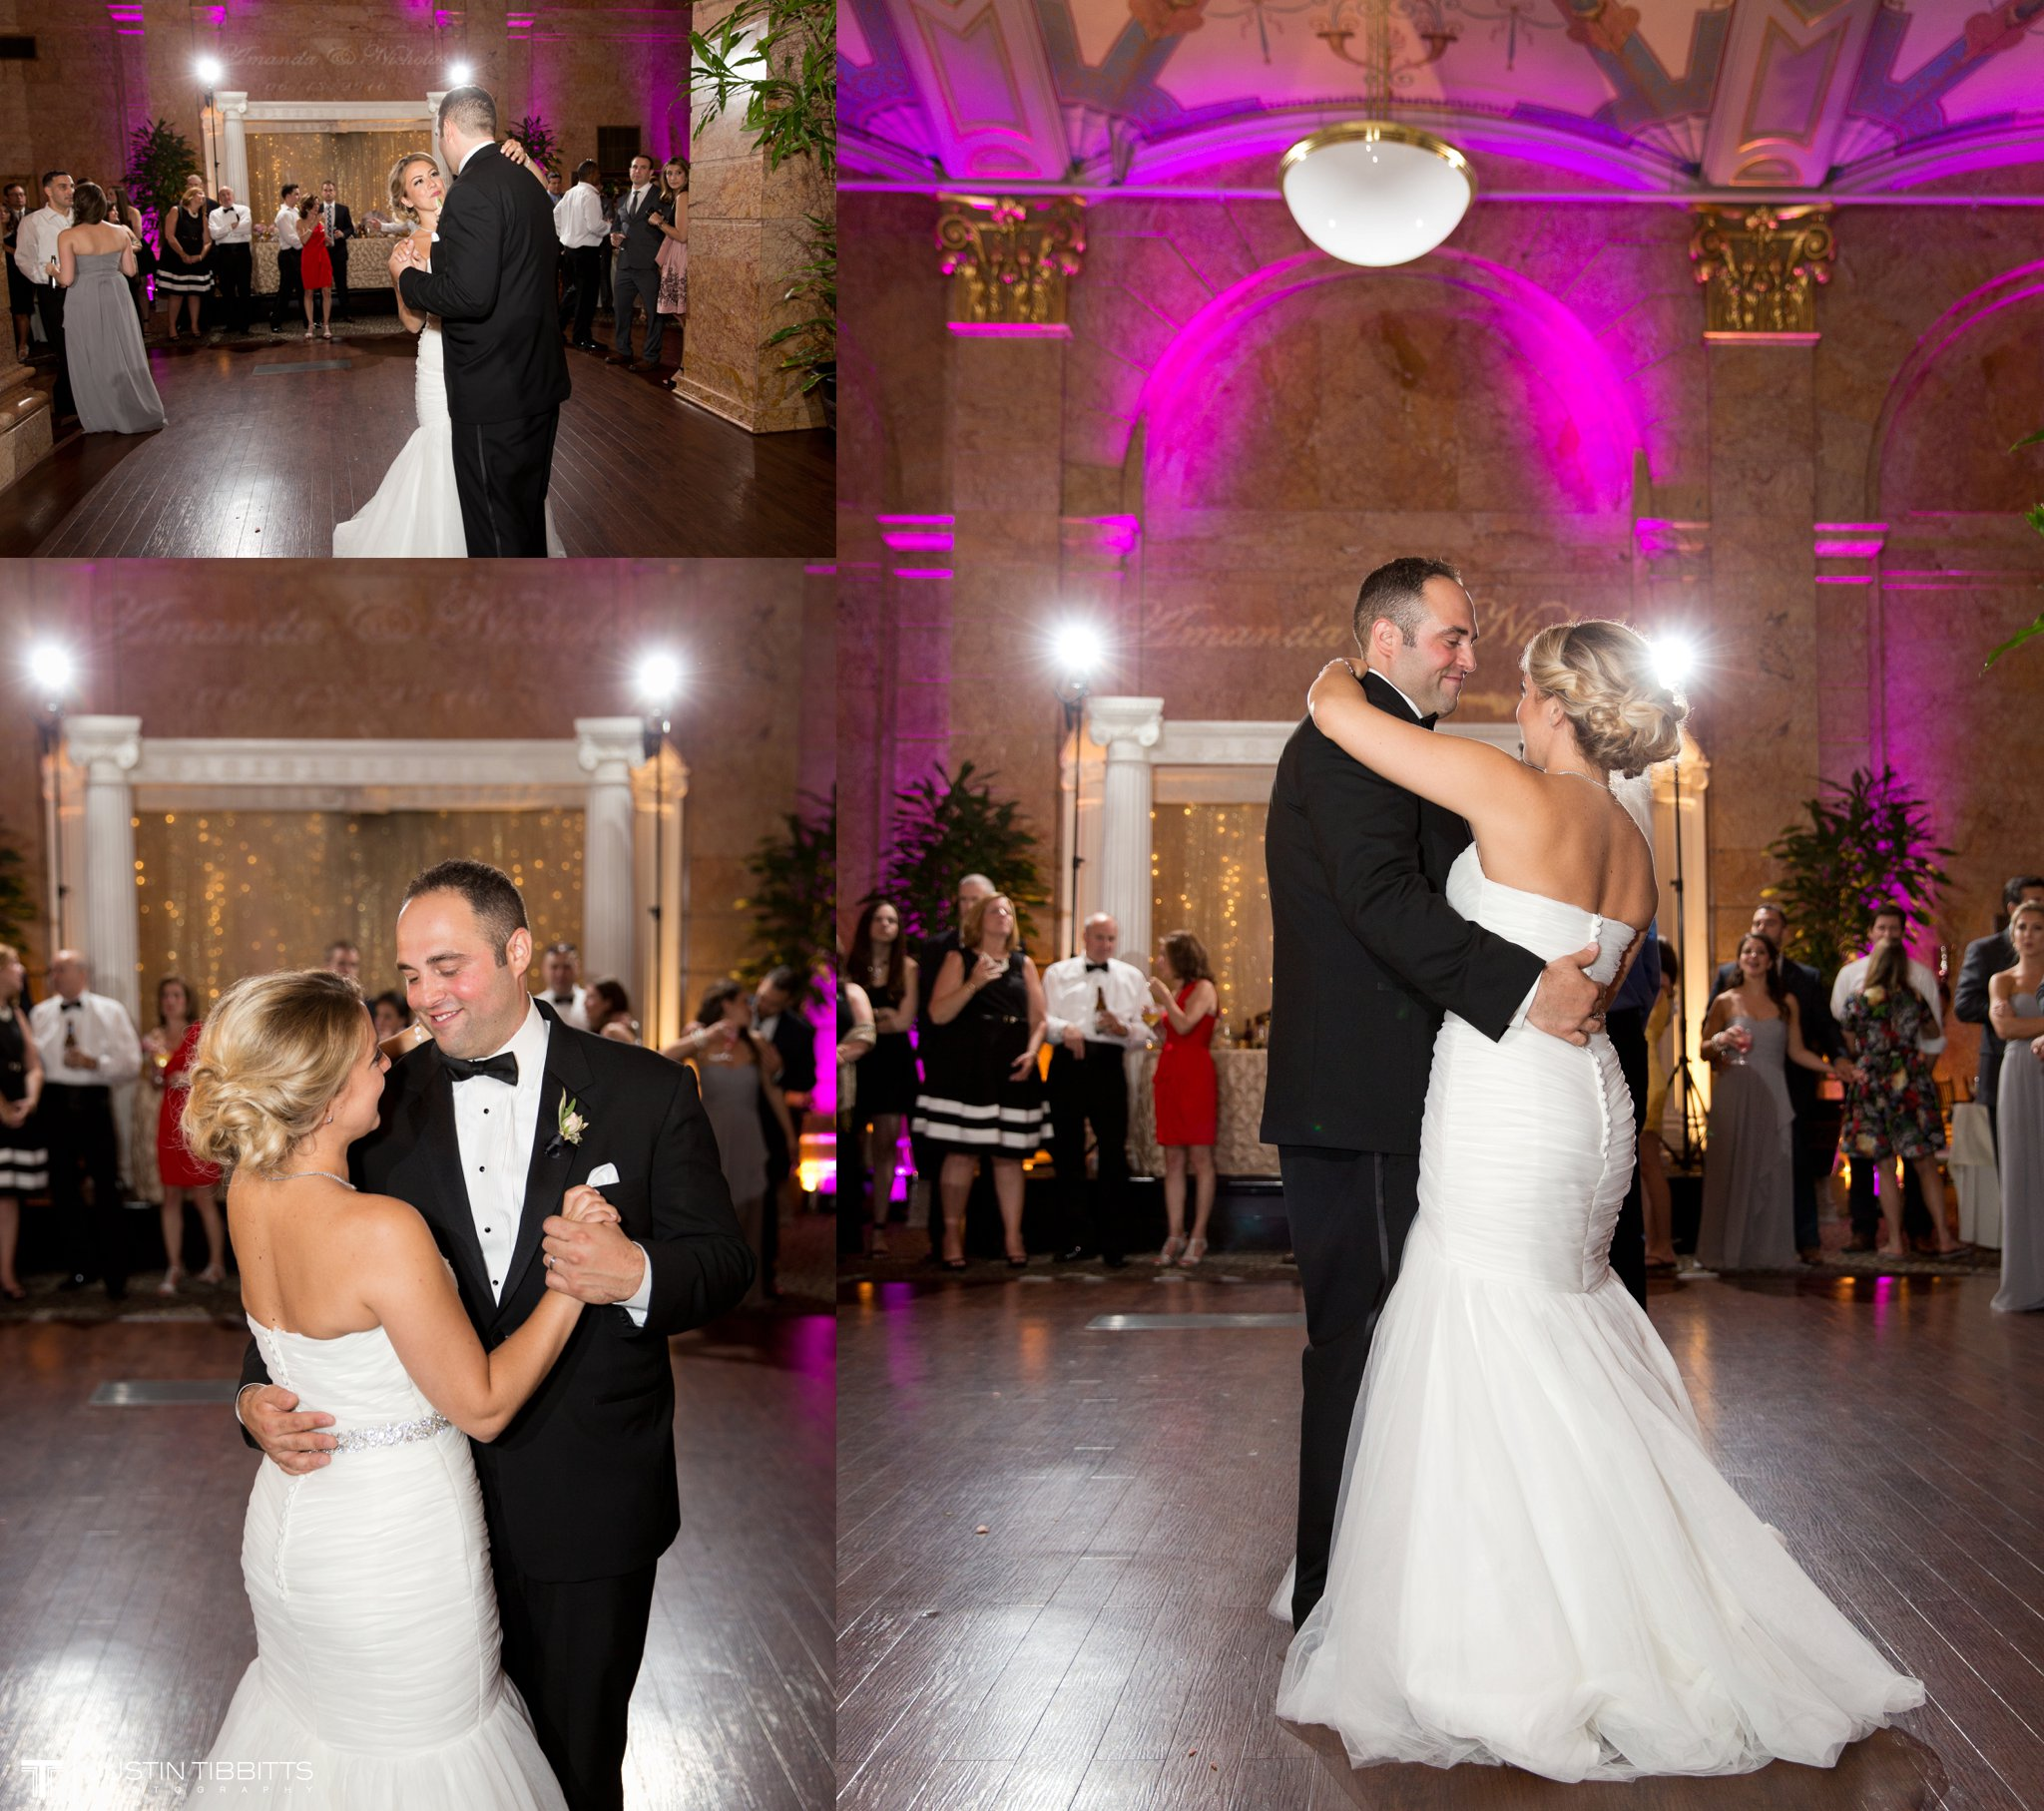 state-room-wedding-photos-with-amanda-and-nick_0184